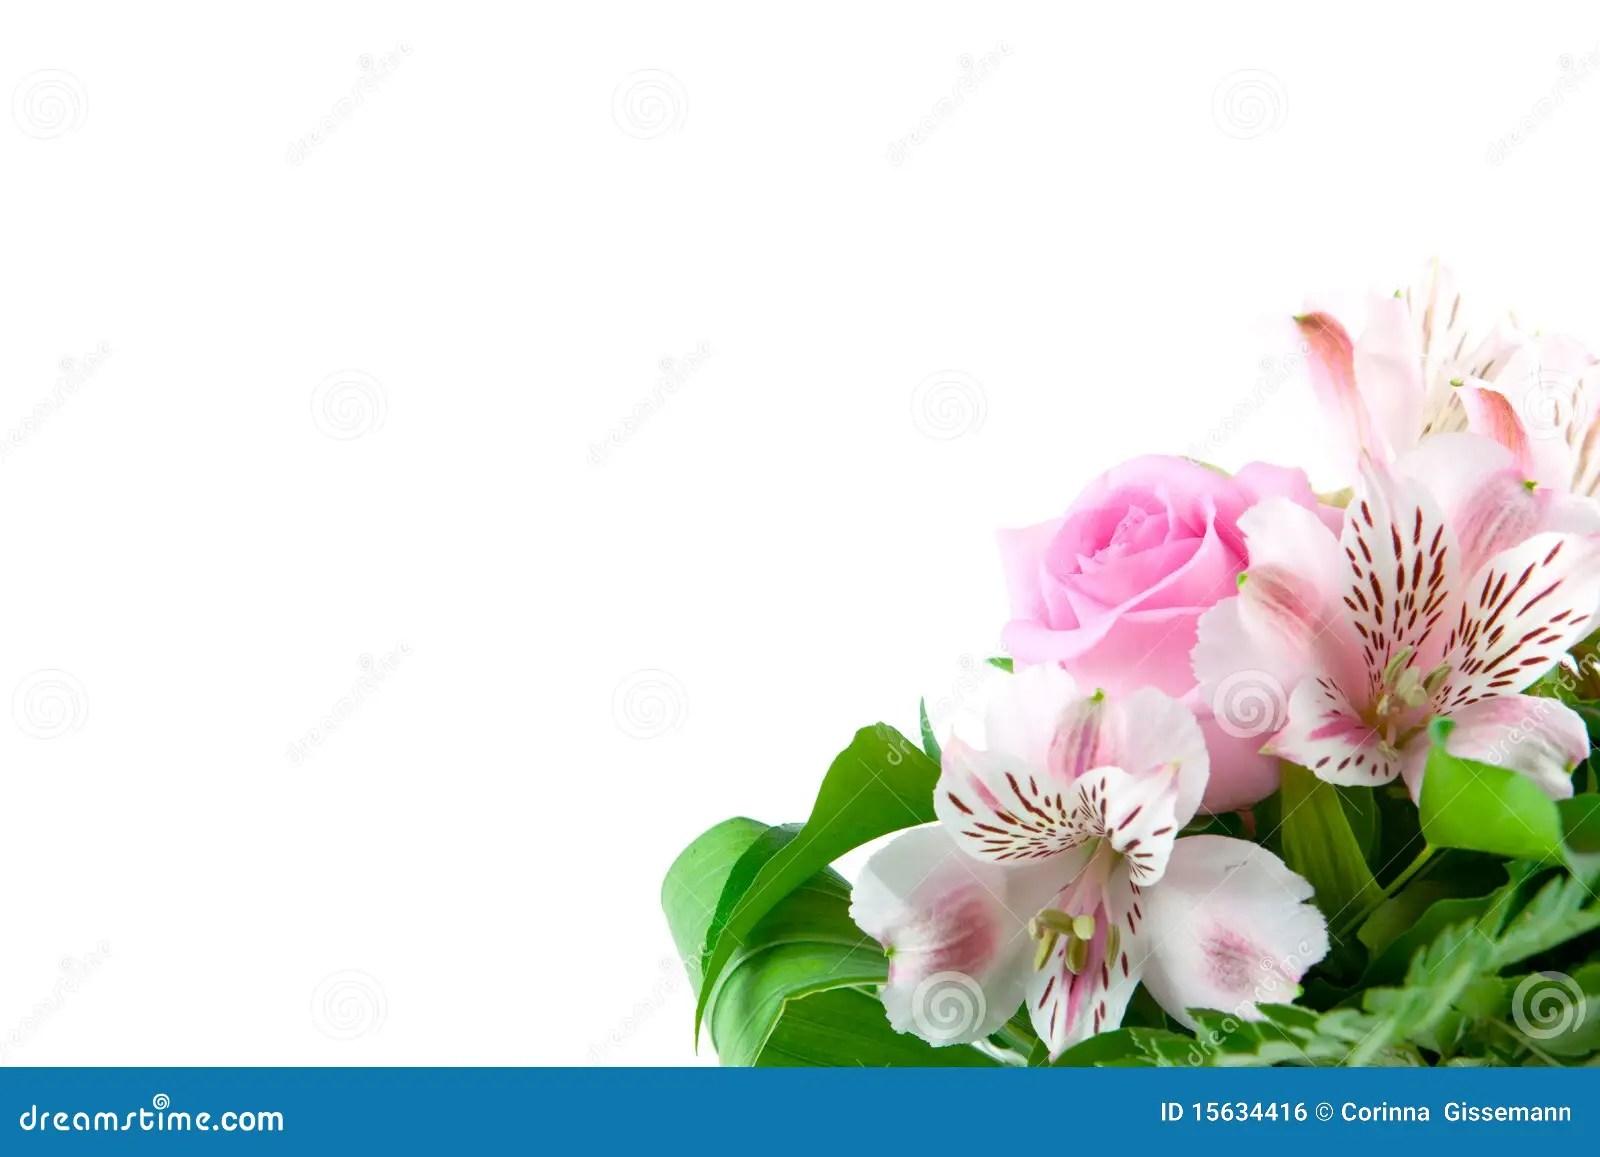 flower greetings stock photo